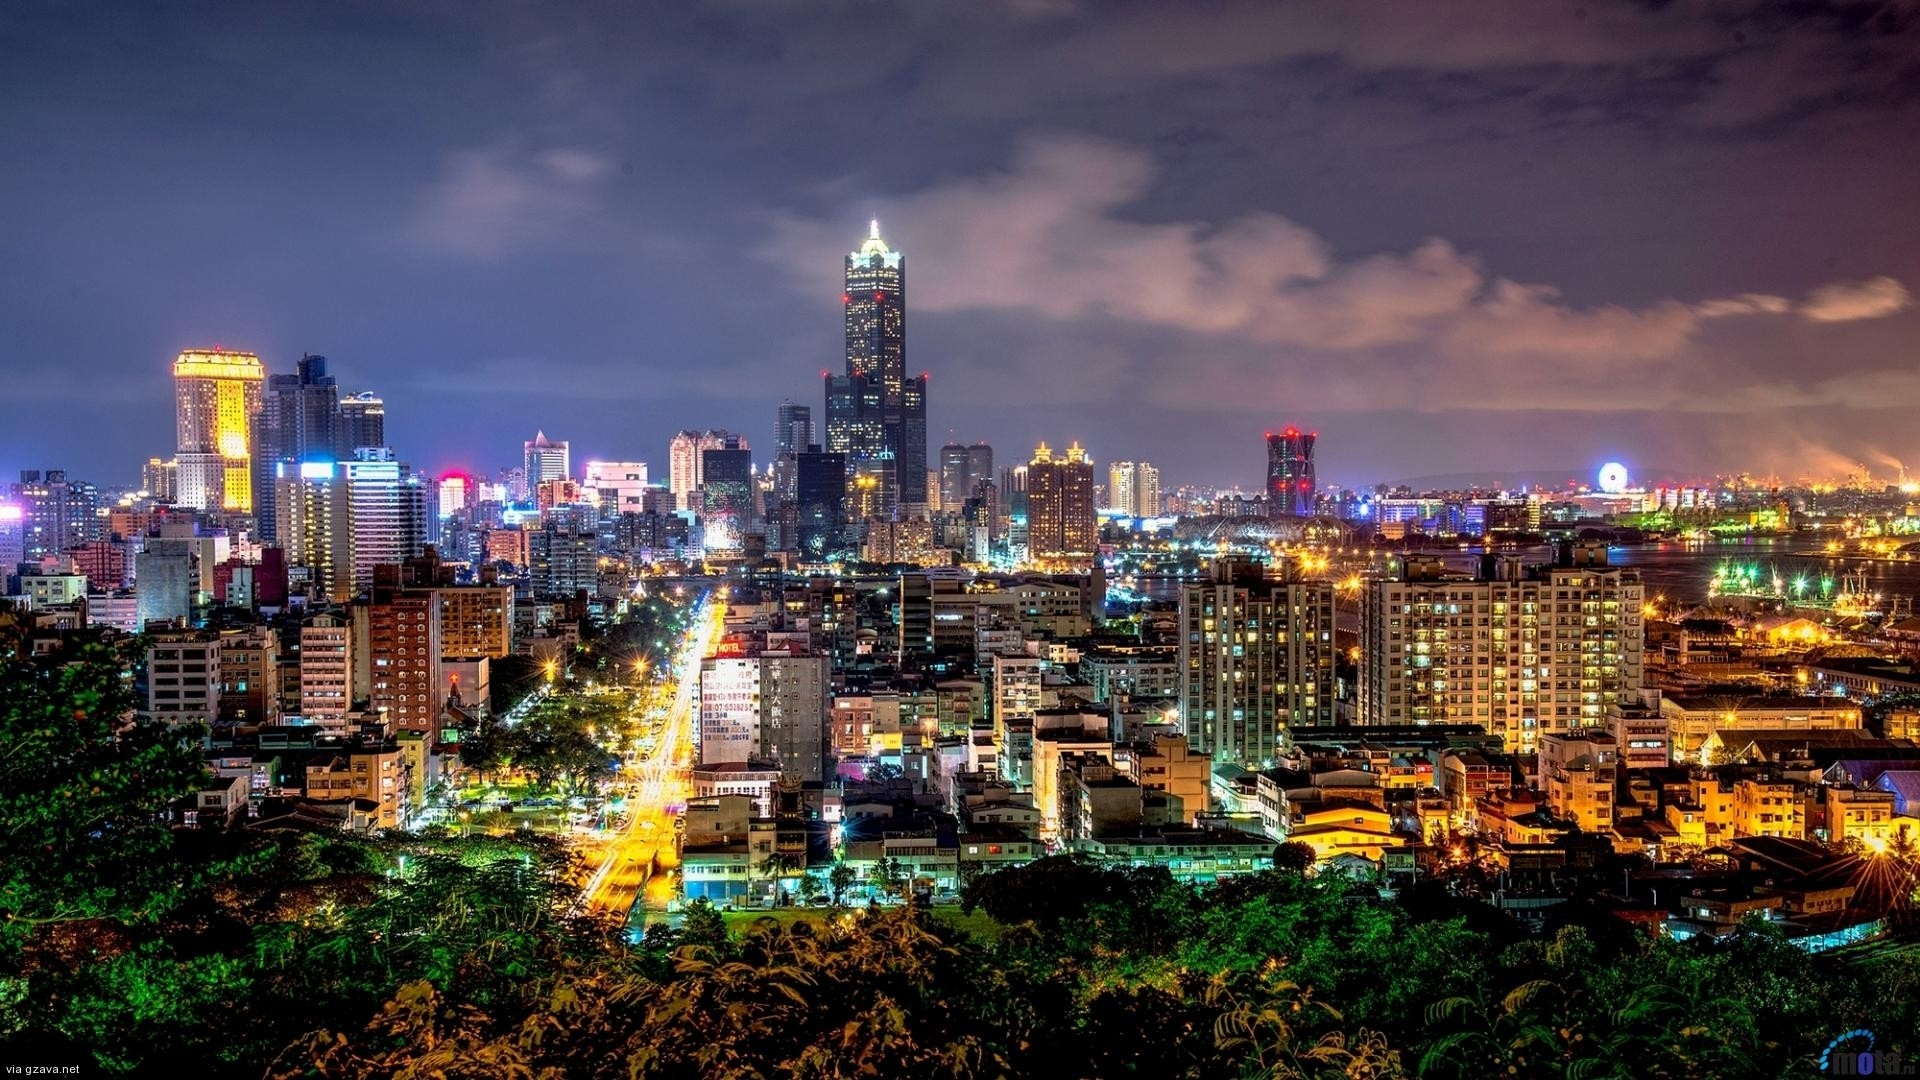 taiwan city at night wallpaper hd - media file | pixelstalk